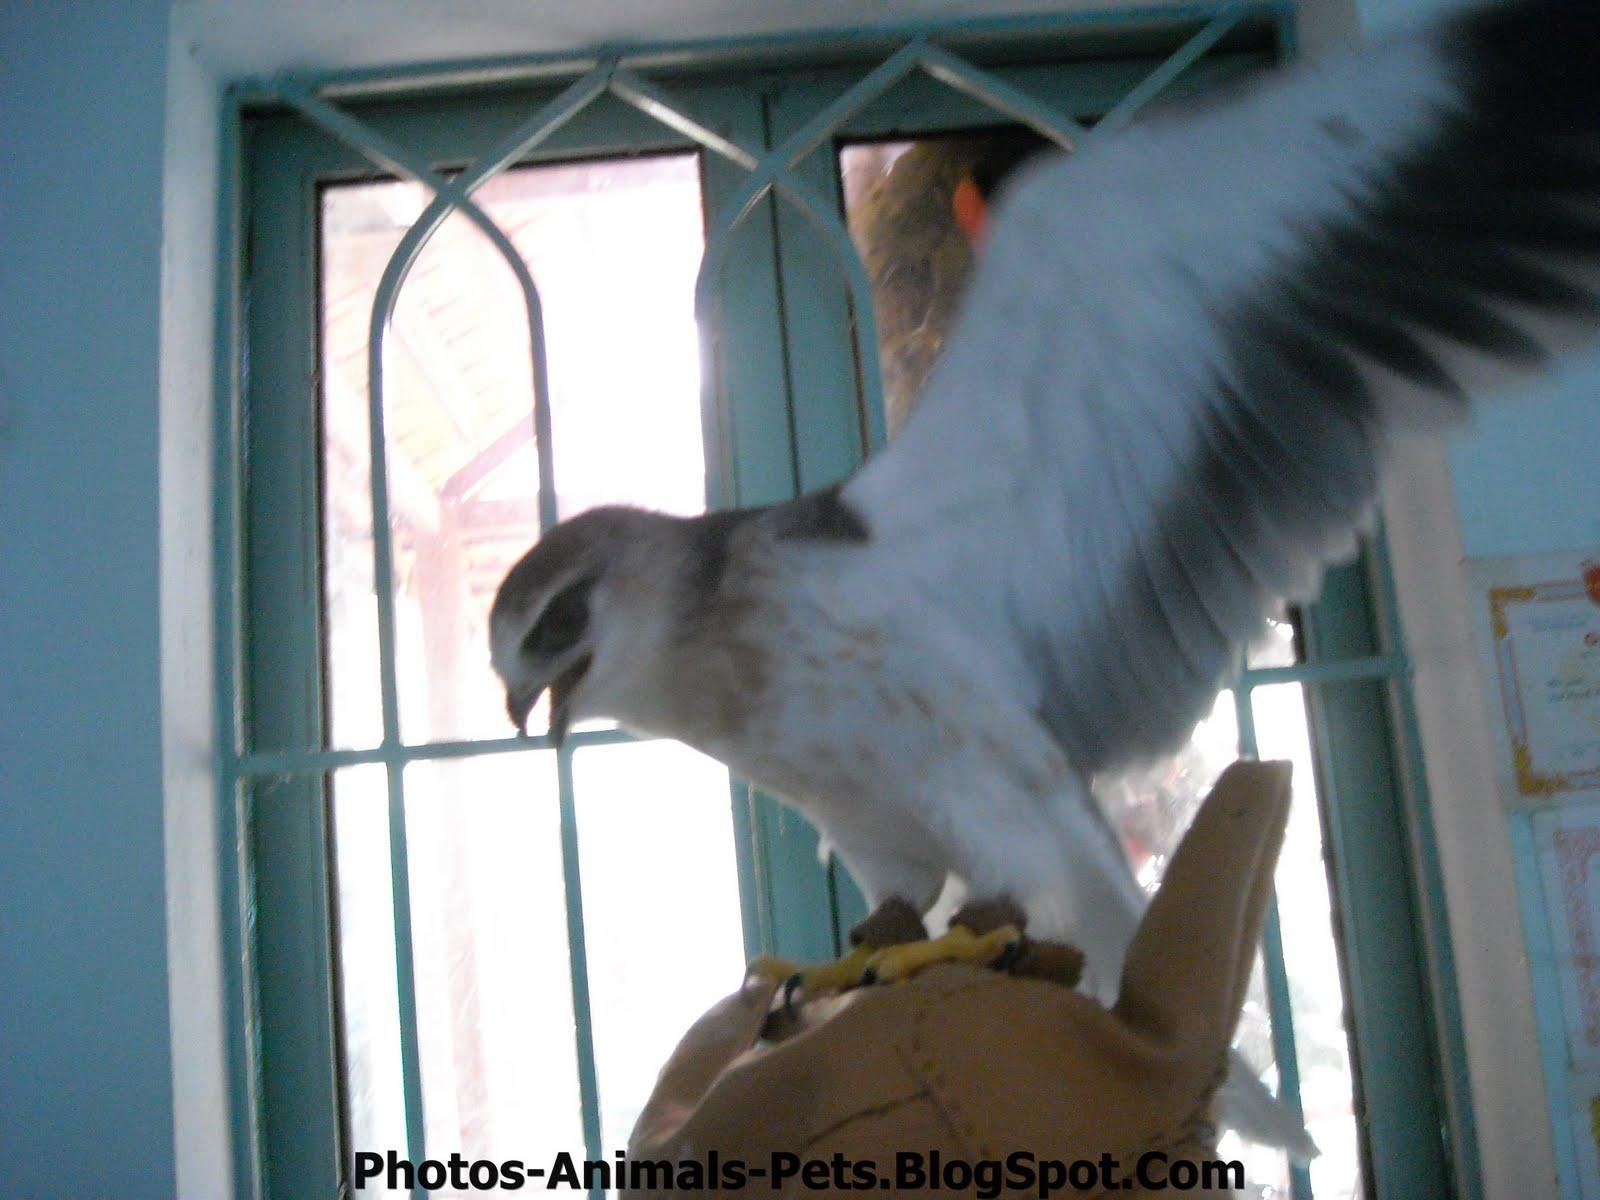 http://4.bp.blogspot.com/-fQWczbz6AwQ/TxRakqLnddI/AAAAAAAAC2Q/9olUsfI551U/s1600/Pet%2Bbird%2Bpictures.jpg